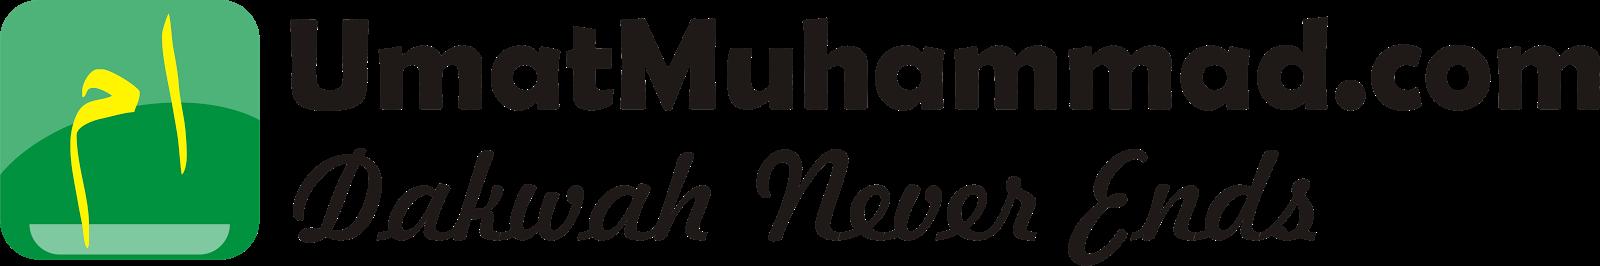 UmatMuhammad.com - Dakwah Never Ends